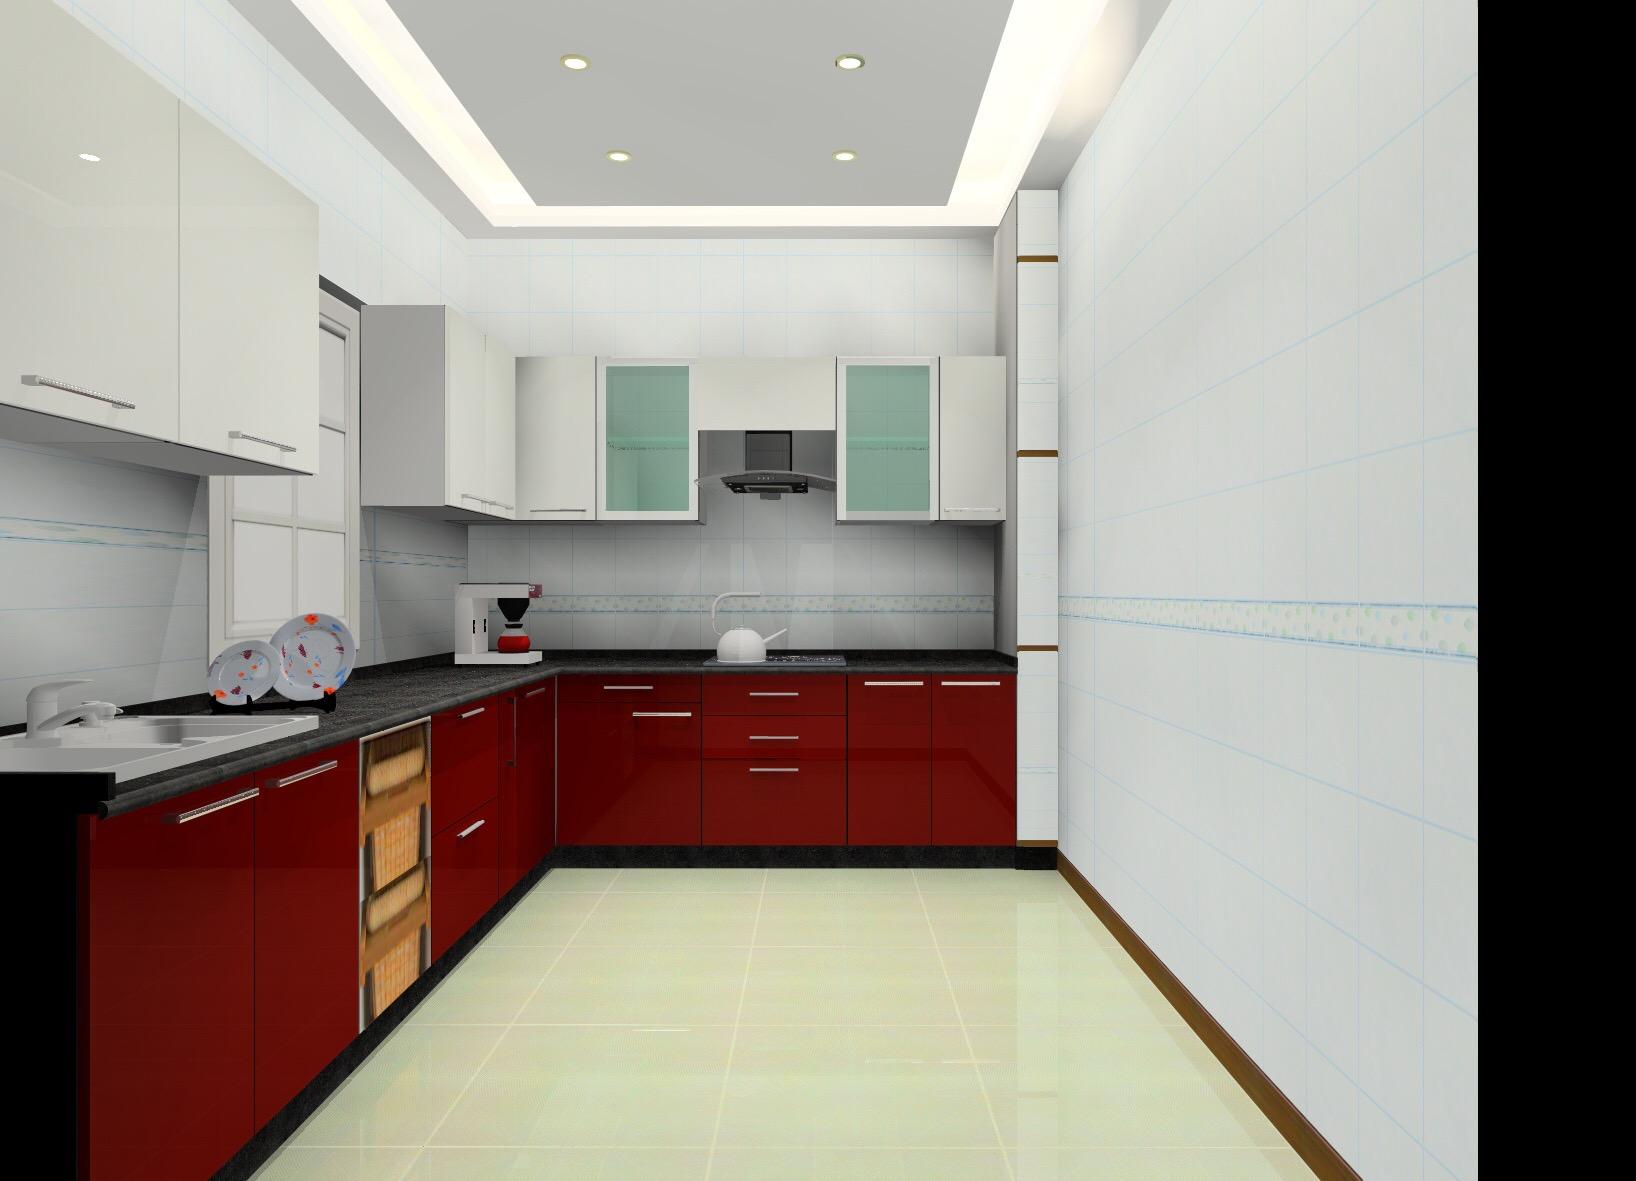 Modular Kitchen Dealers in Mahipalpur, Delhi | Sulekha Delhi